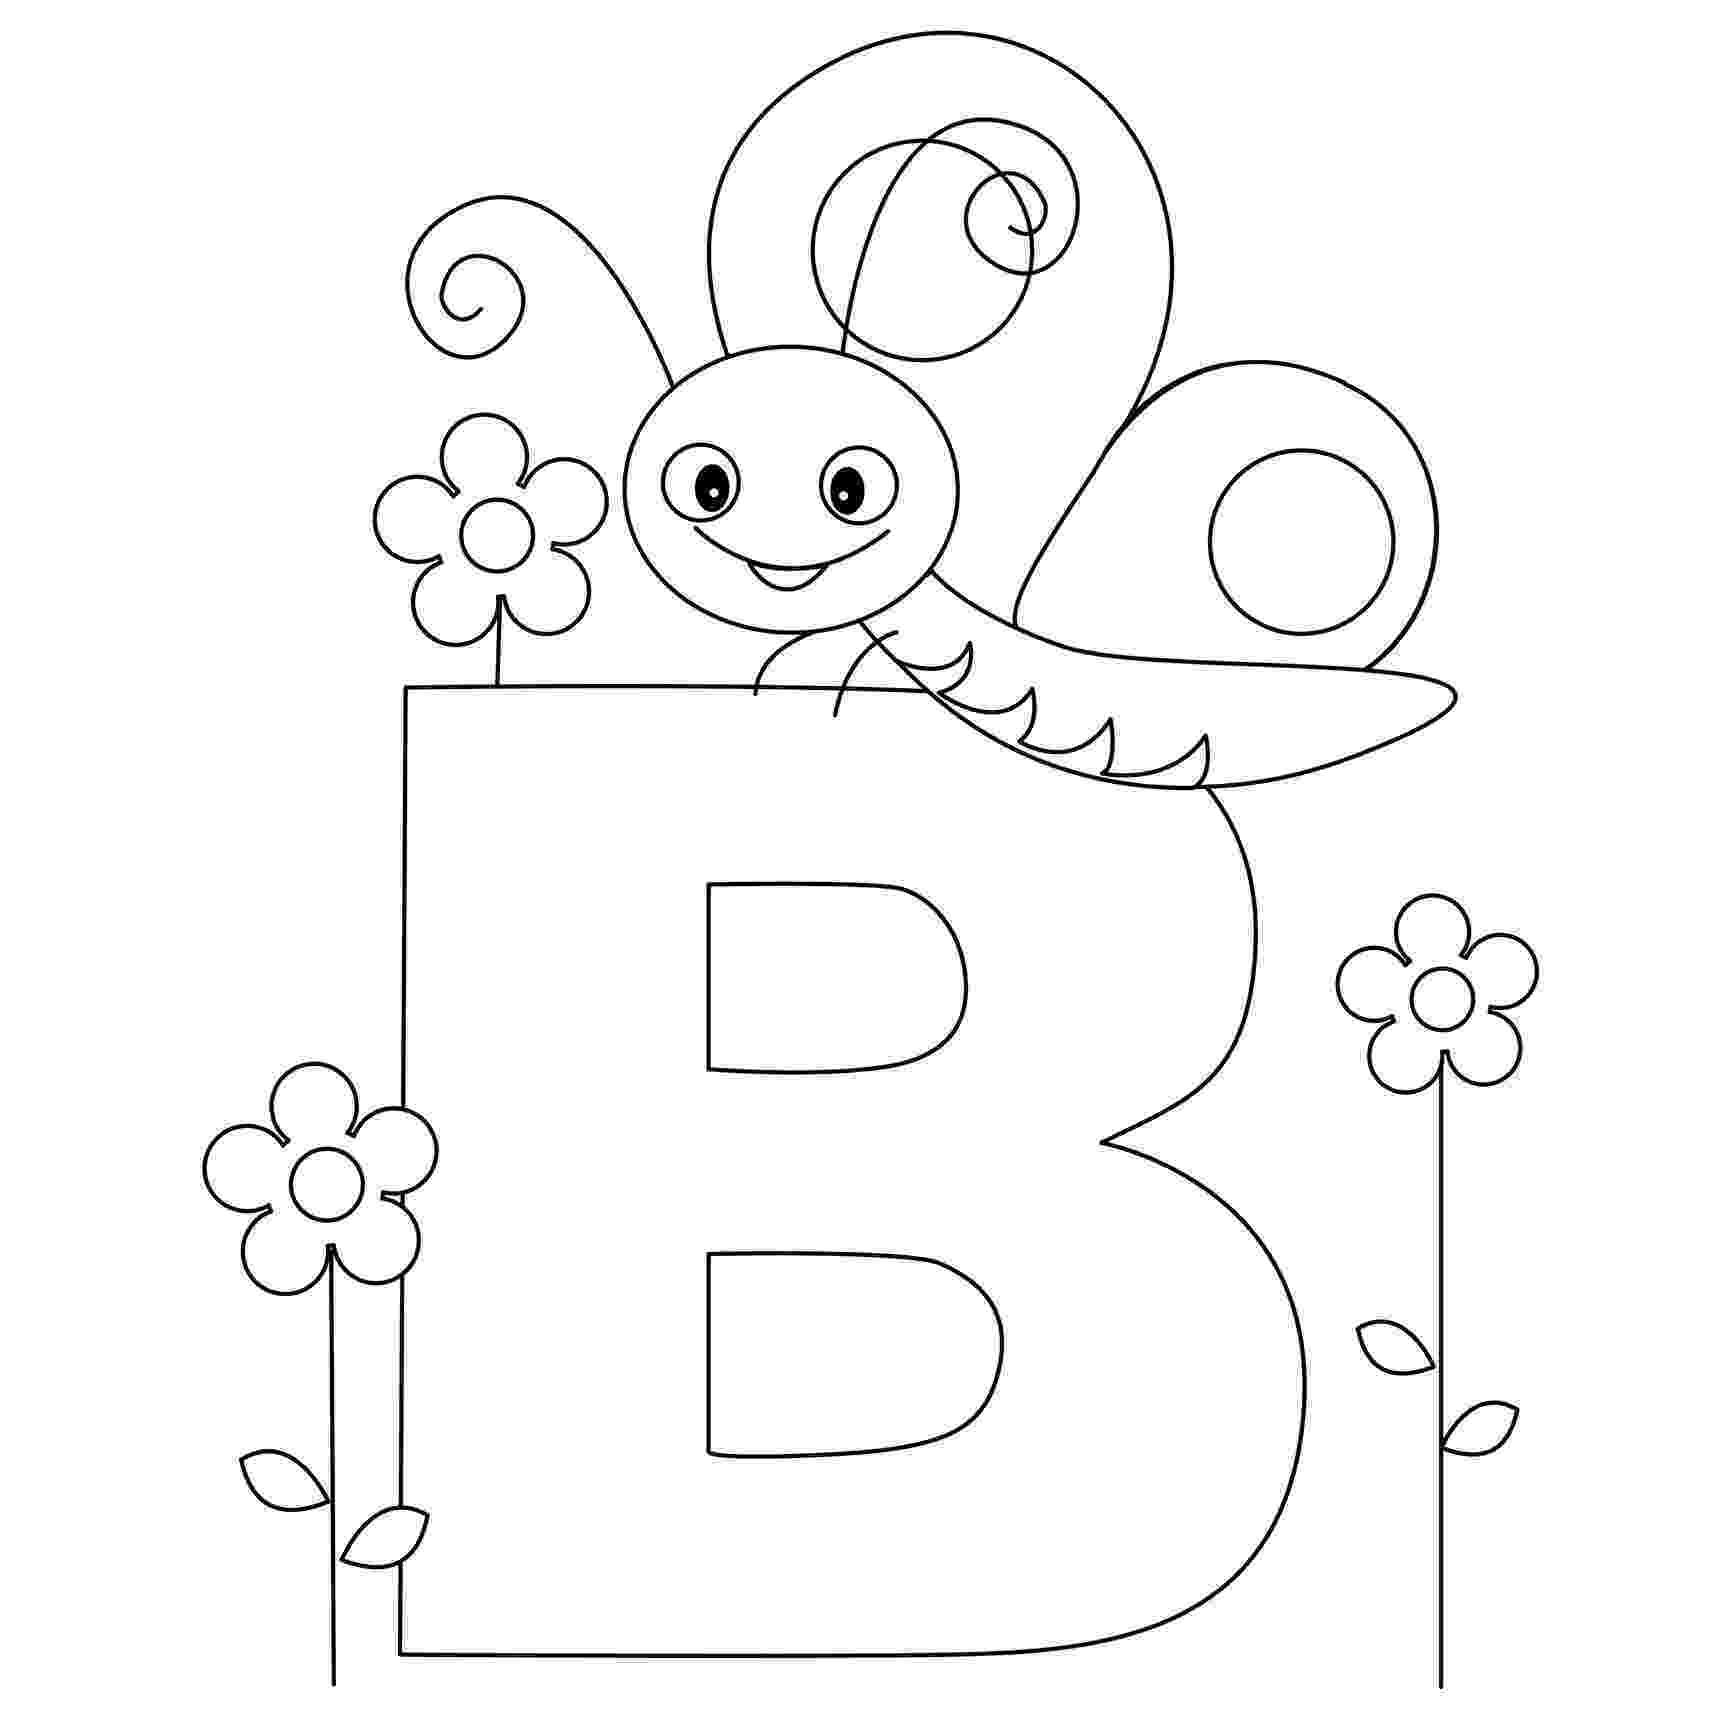 alphabet coloring worksheets free printable alphabet coloring pages for kids best worksheets coloring alphabet